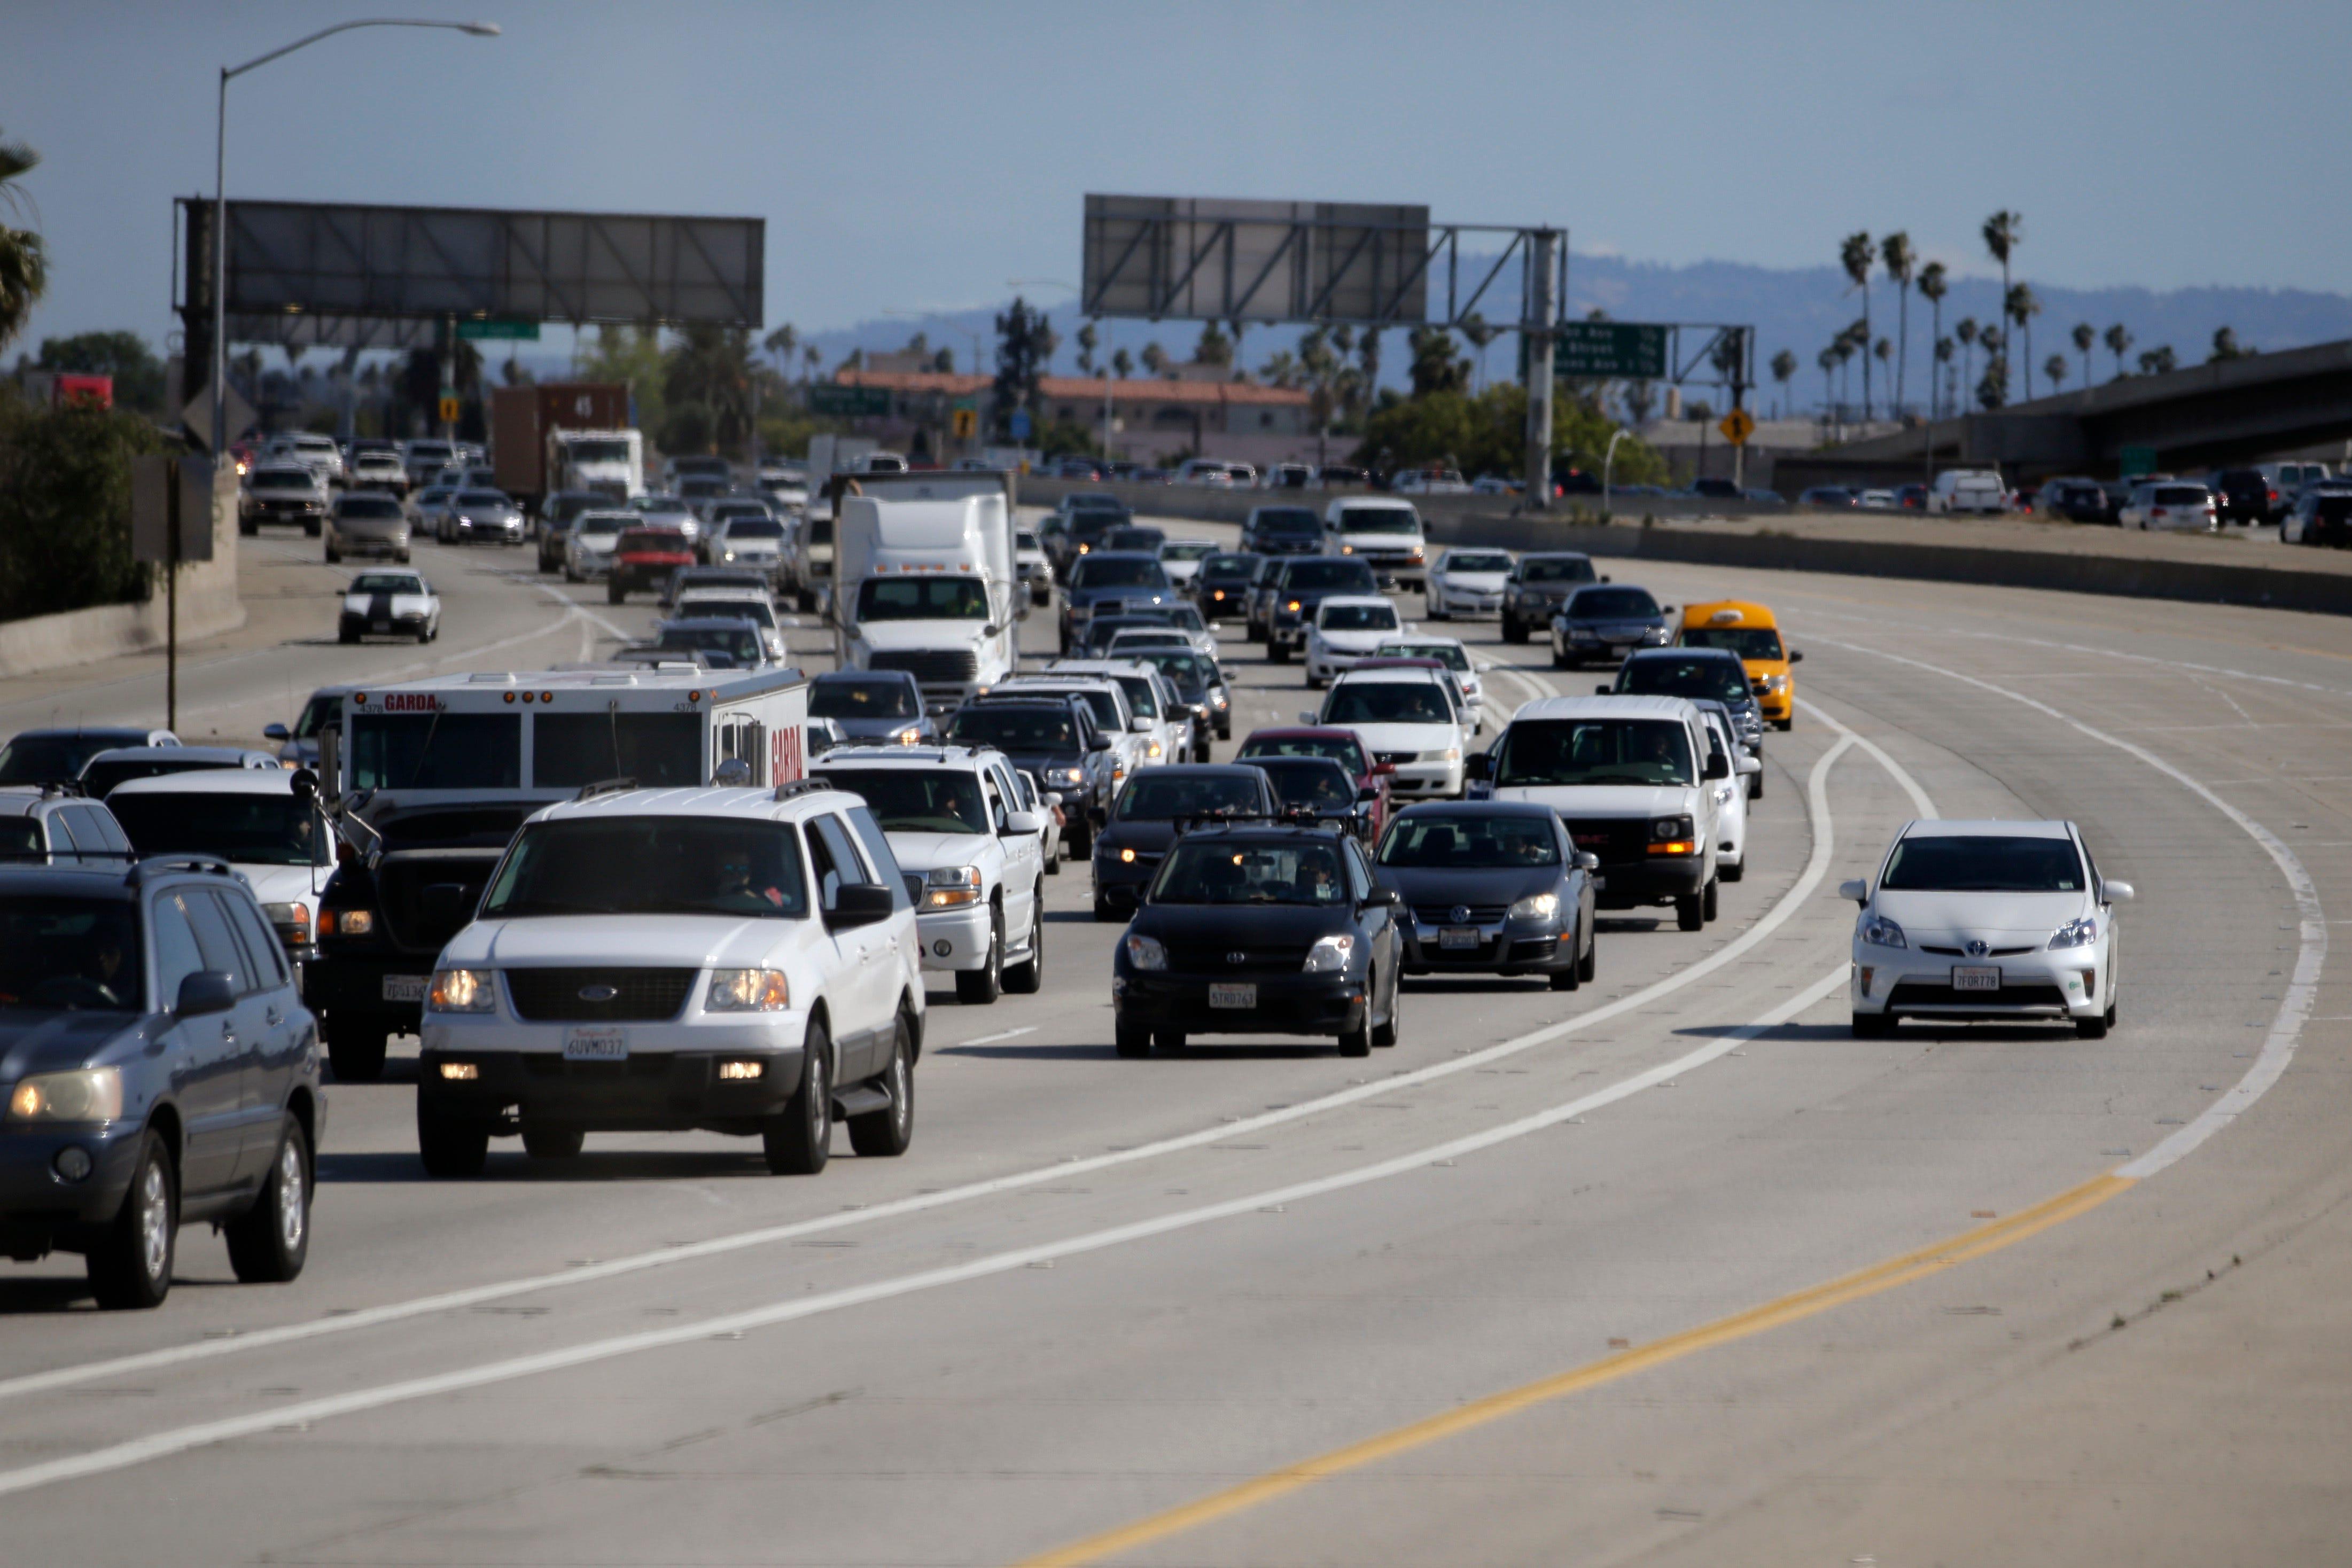 Minor 4.0-magnitude earthquake strikes in Los Angeles area 1